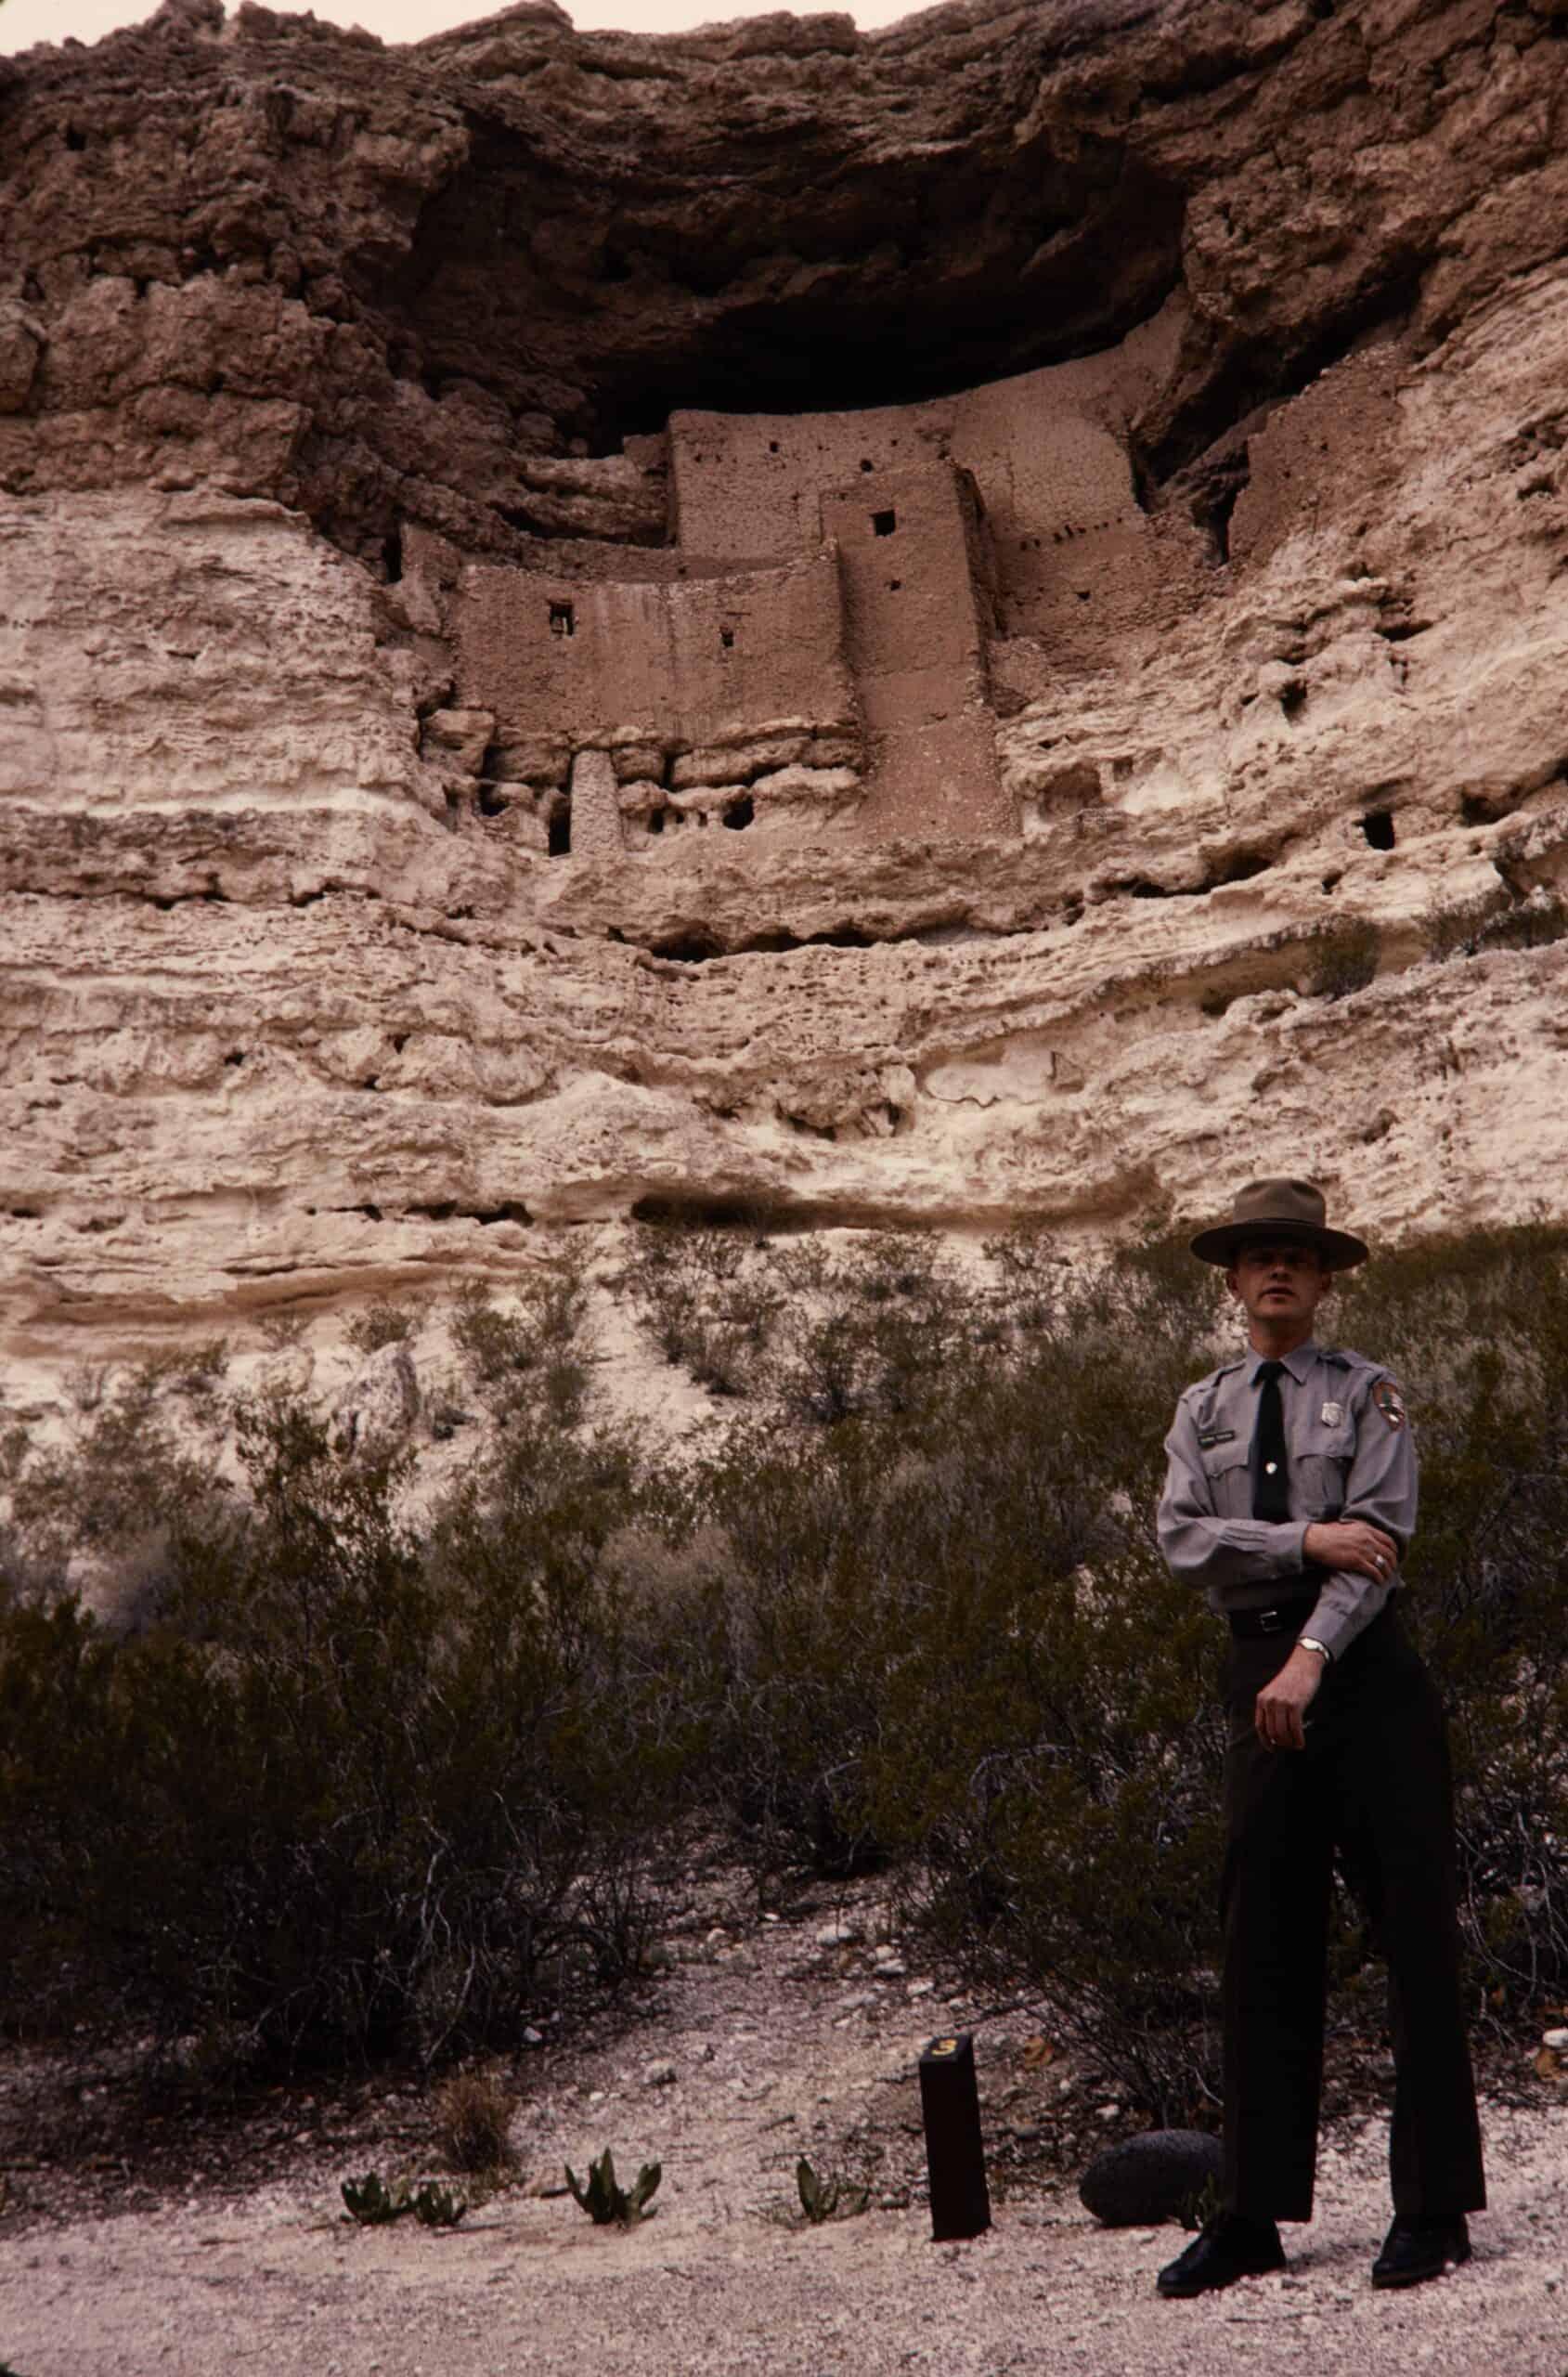 national park ranger in front of Montezuma National Monument